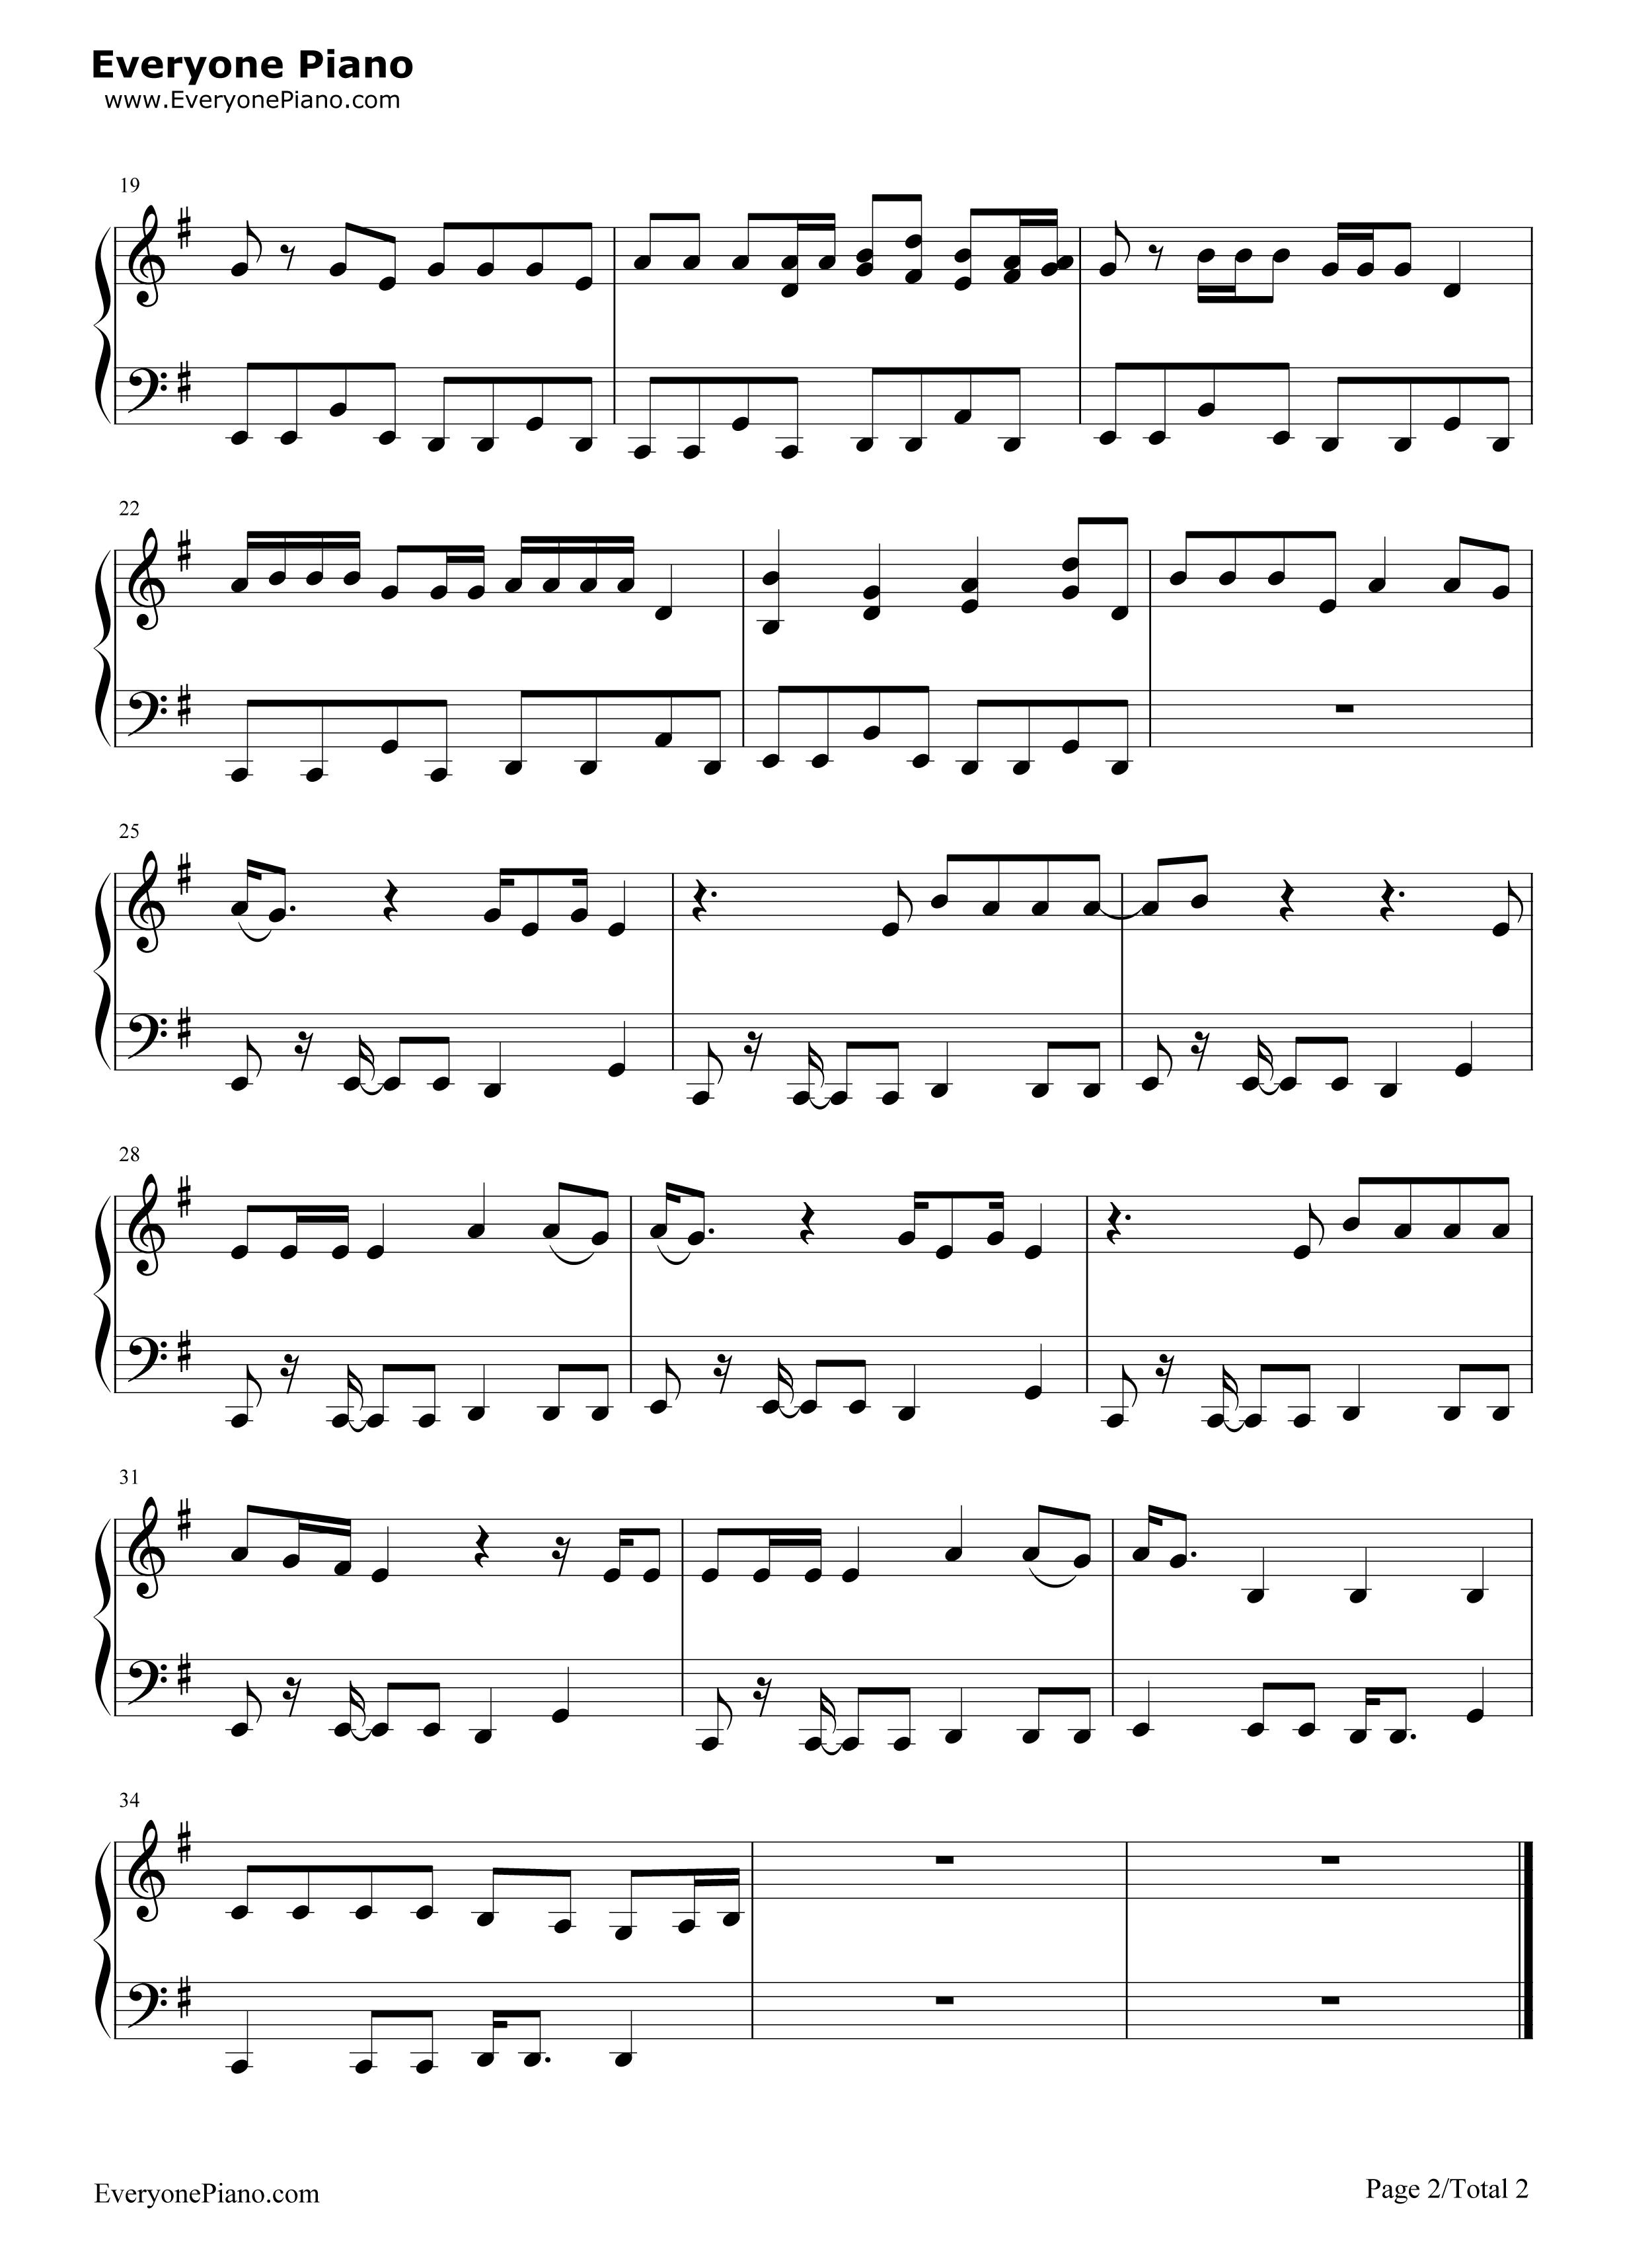 software that plays pdf sheet music